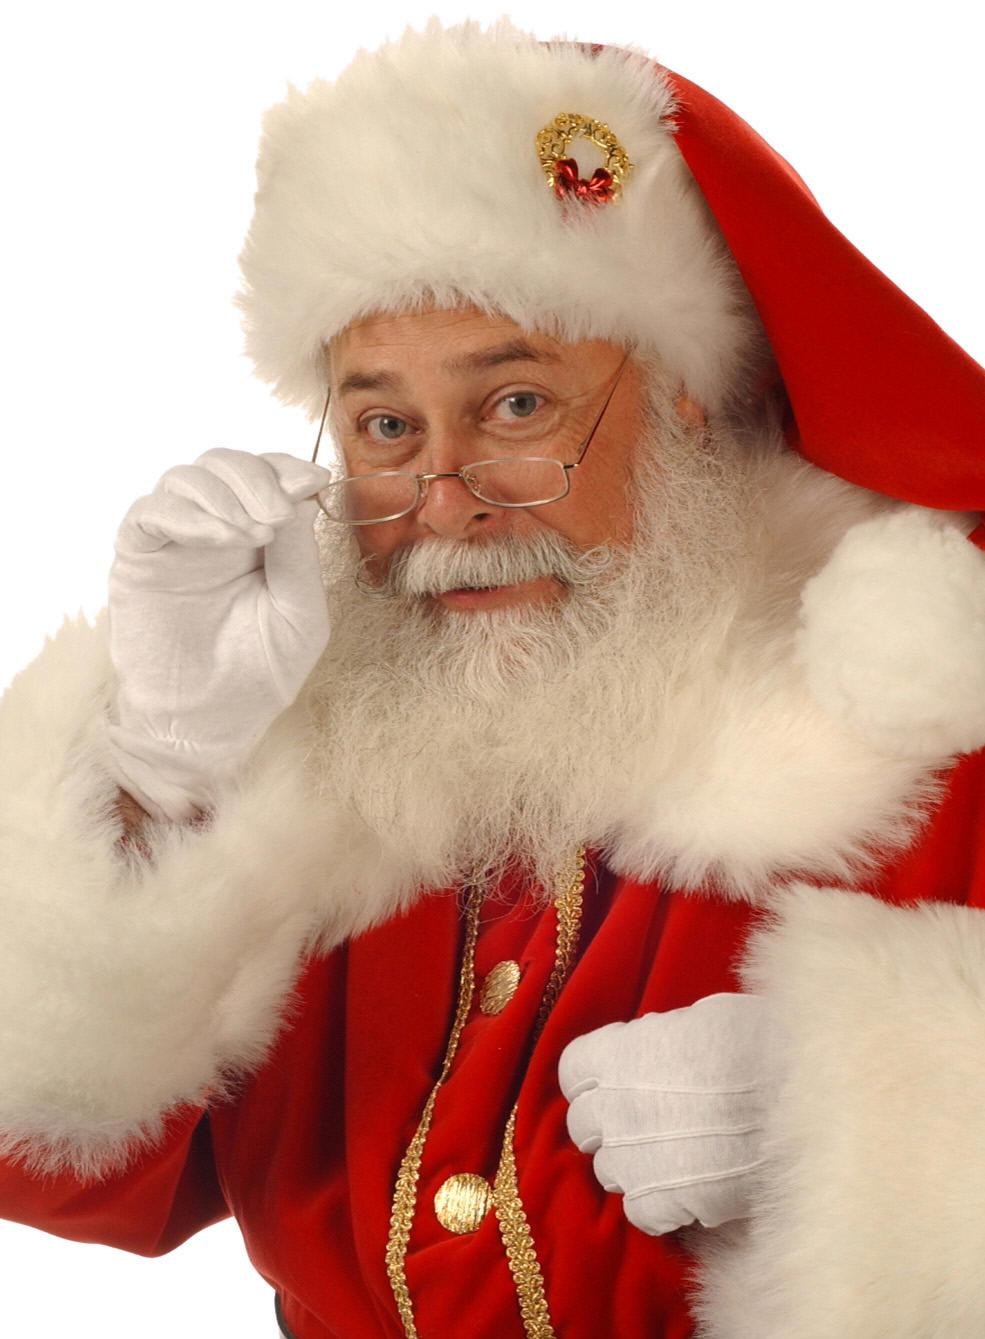 http://www.turnbacktogod.com/wp-content/uploads/2008/12/santa-claus-pics-0201.jpg